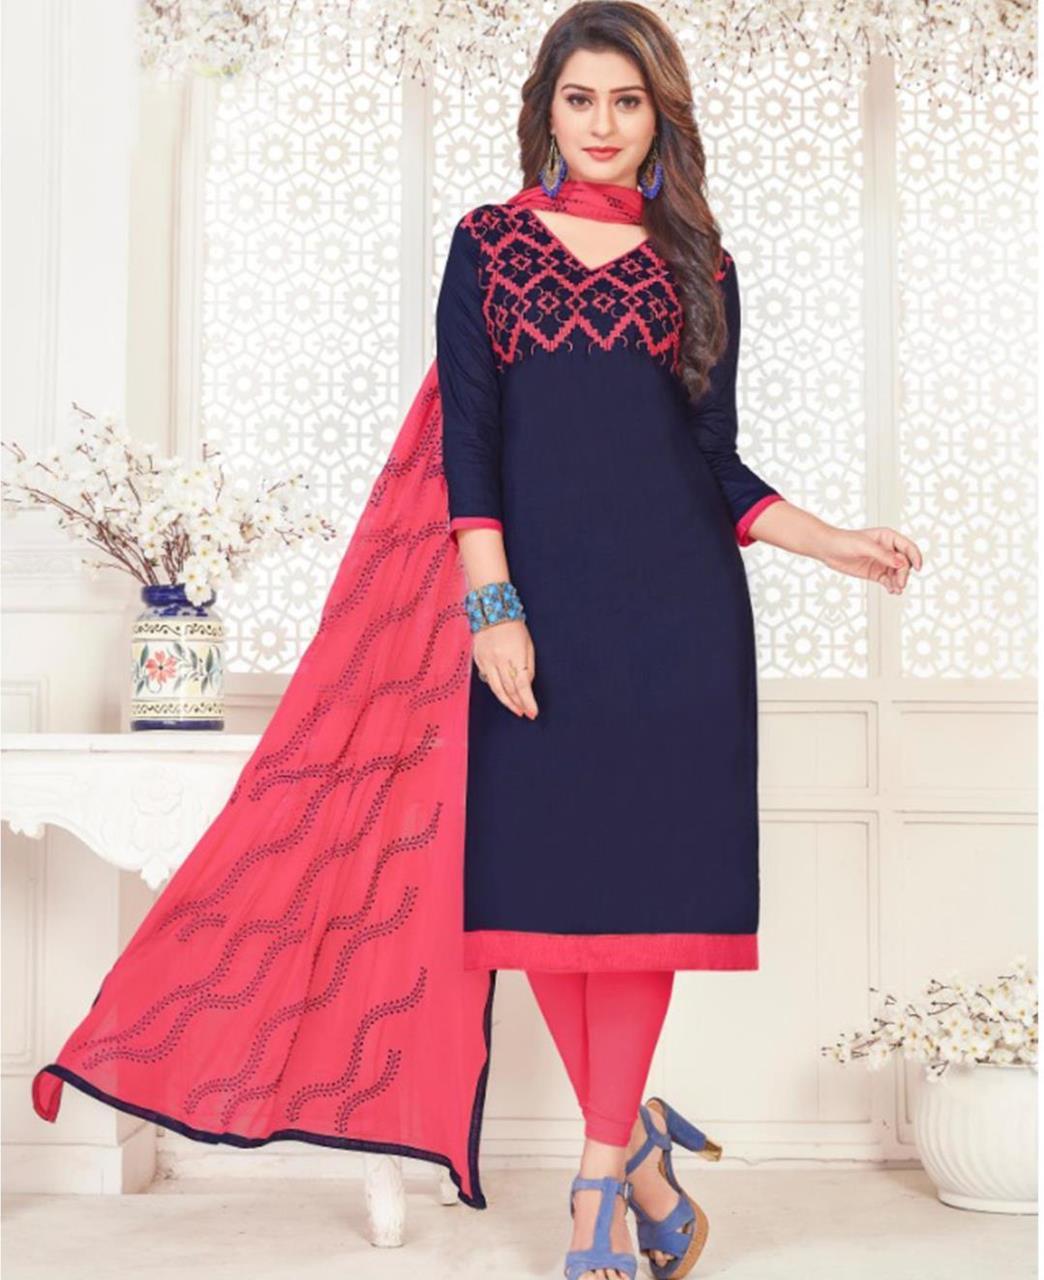 Embroidered Cotton Satin Navyblue Straight Cut Salwar Kameez